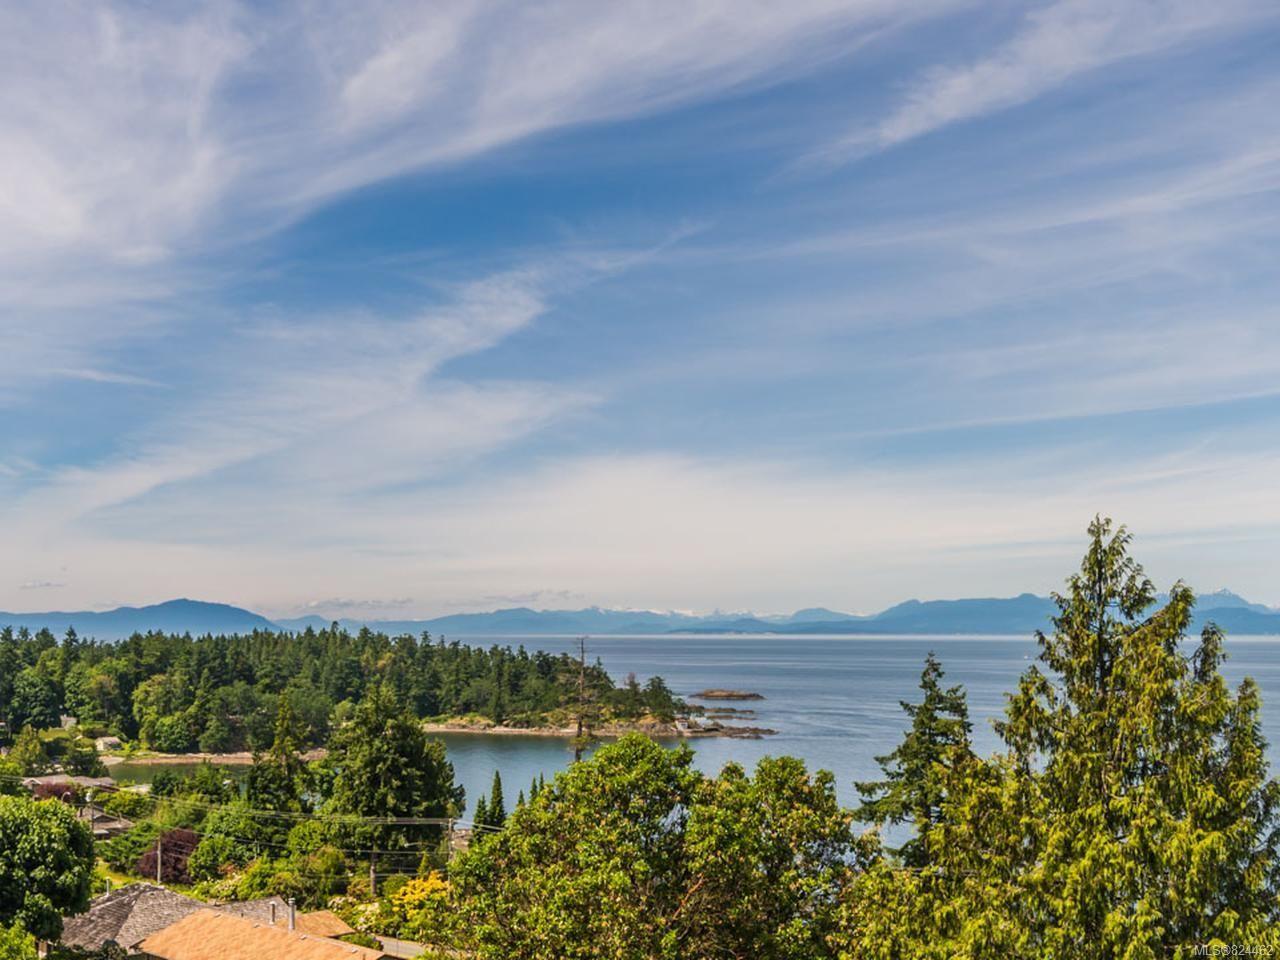 Photo 35: Photos: 3864 Gulfview Dr in NANAIMO: Na North Nanaimo House for sale (Nanaimo)  : MLS®# 824462